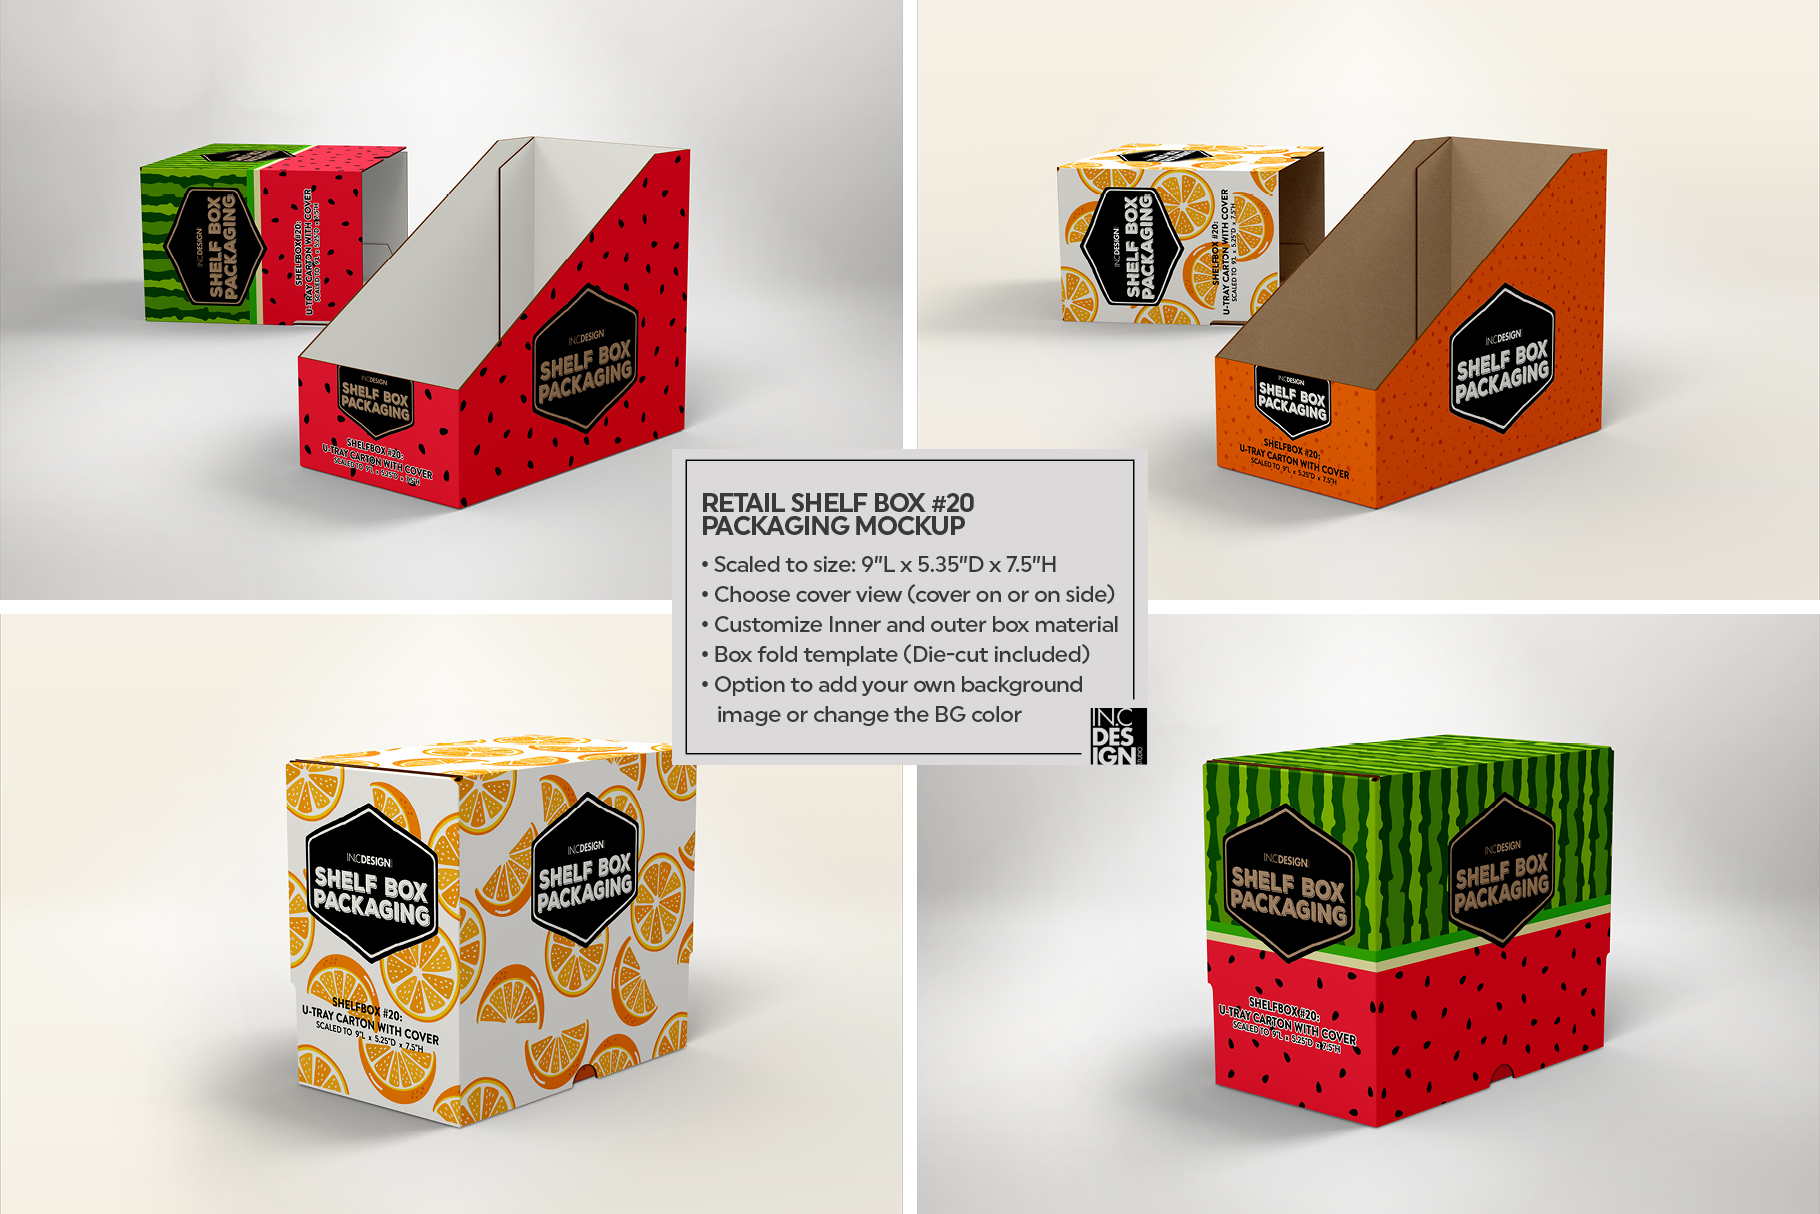 Retail Shelf Box 20 Packaging Mockup example image 2